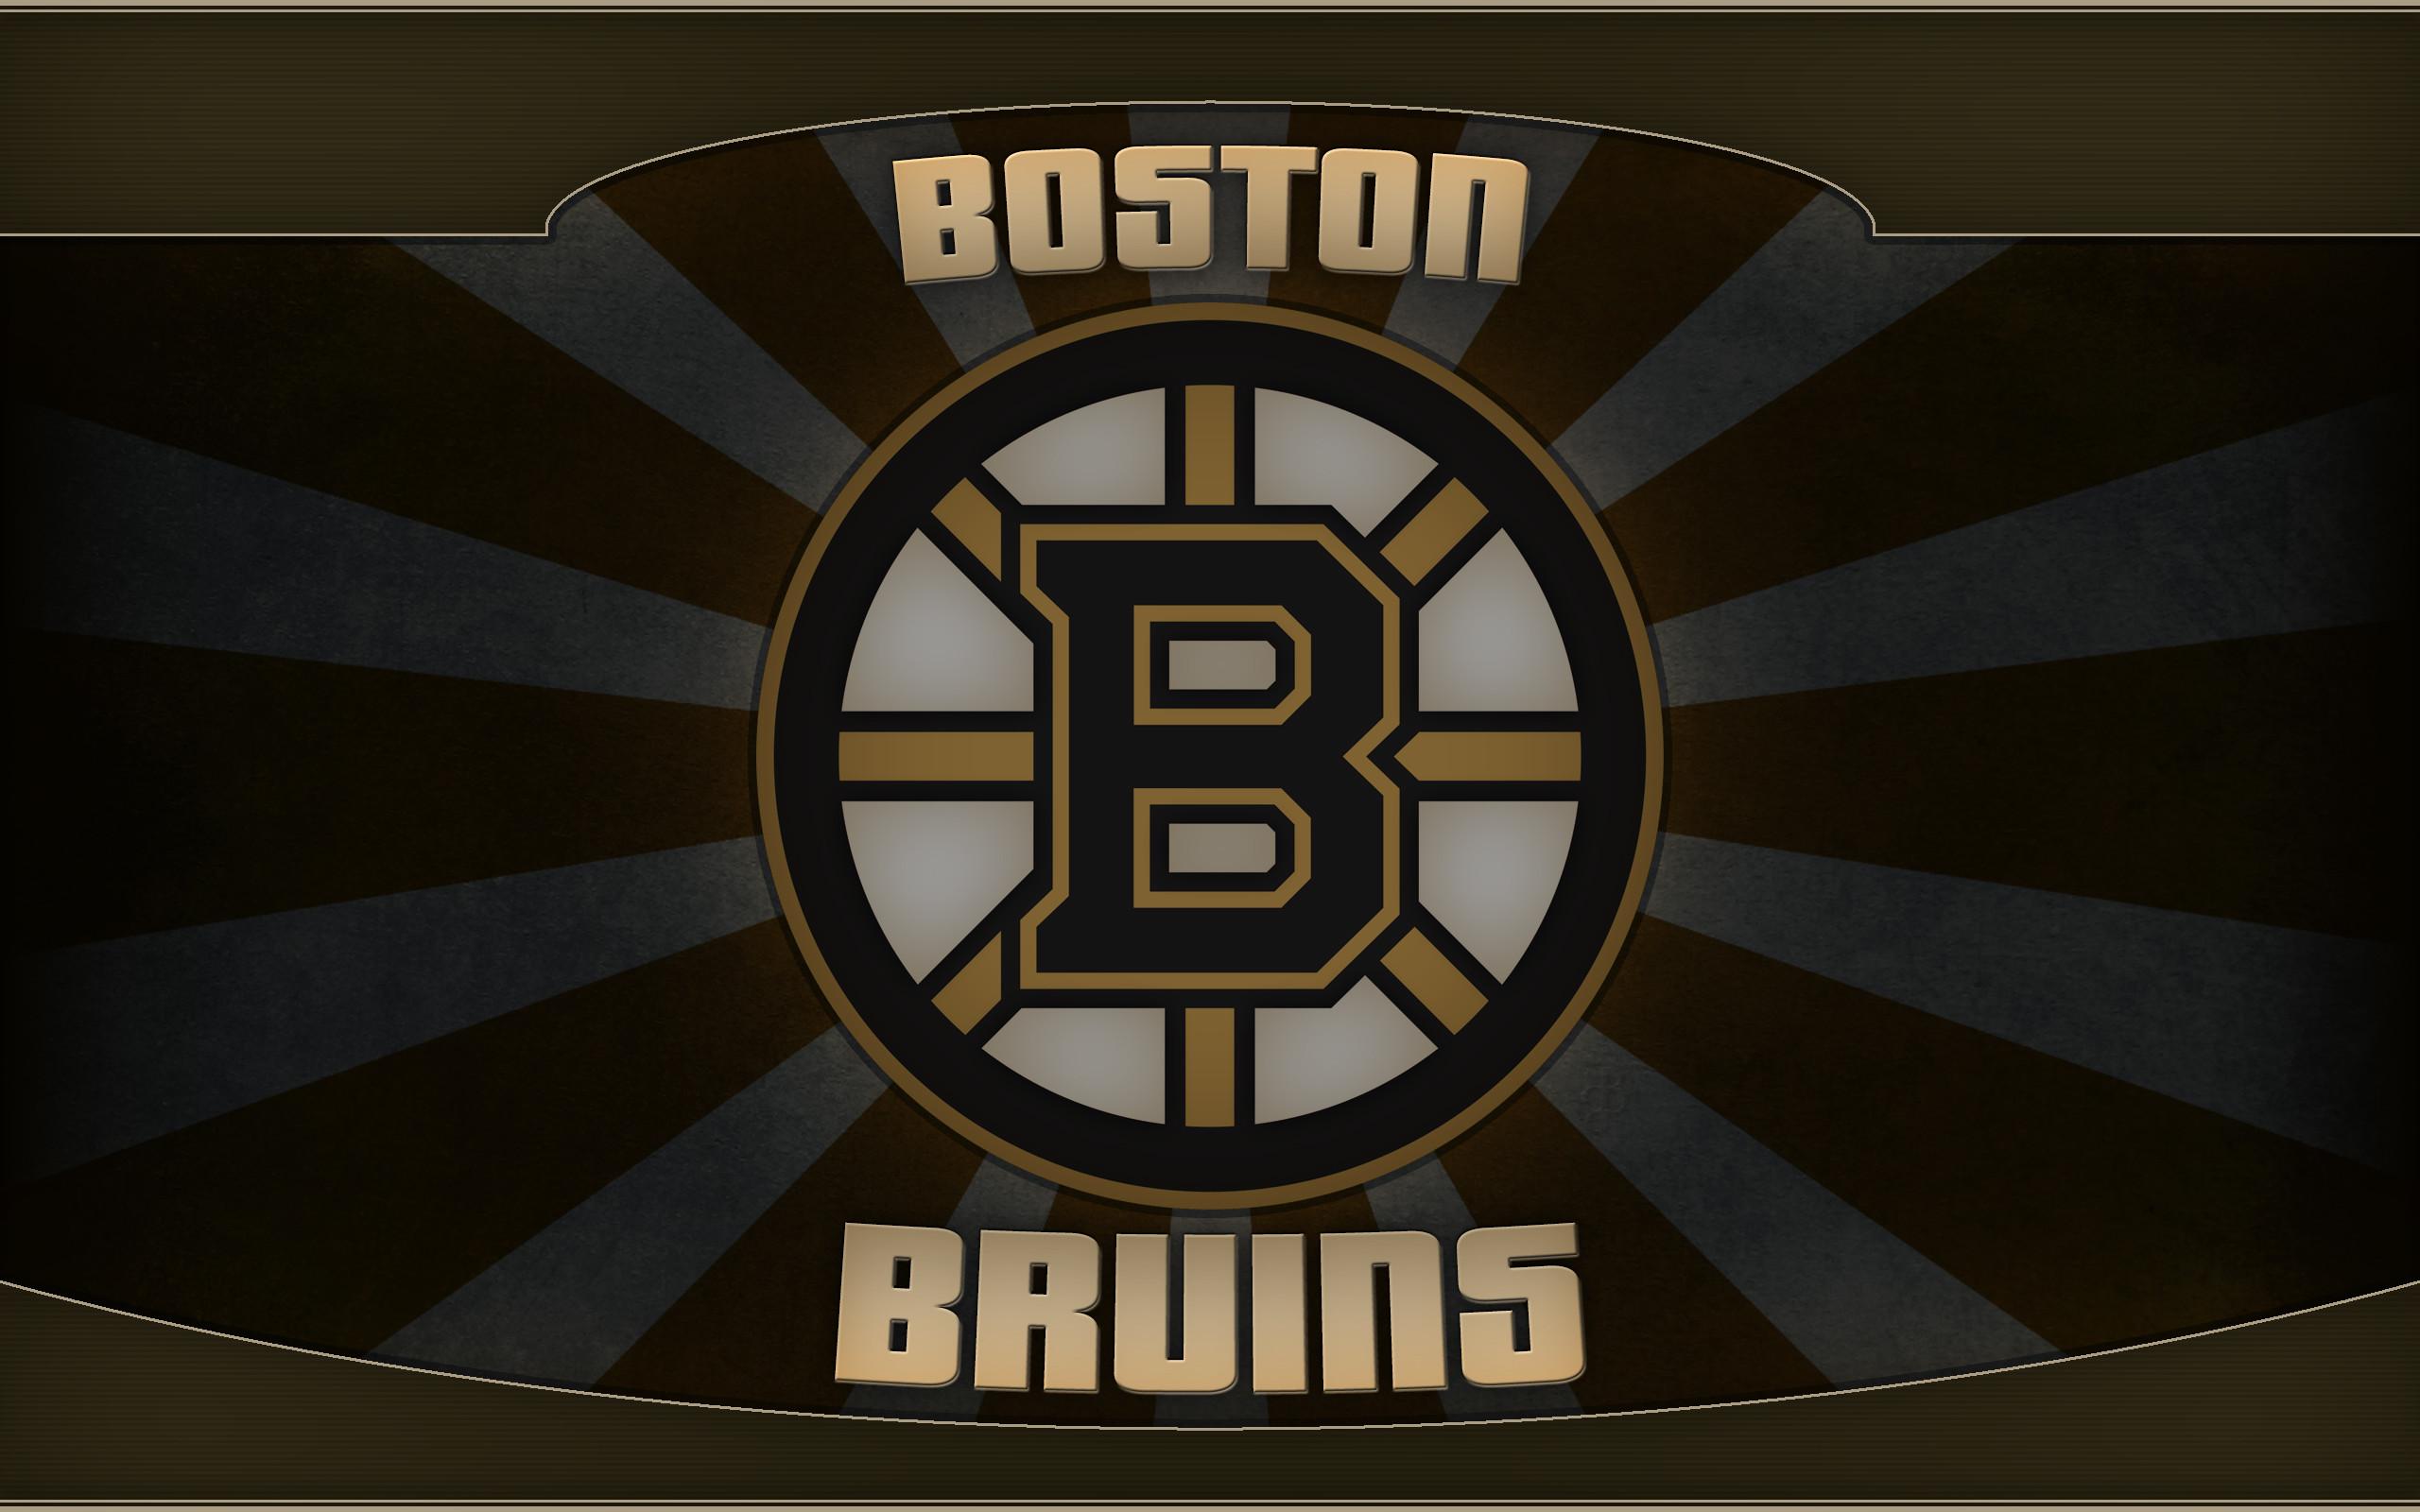 Download Car Wallpaper Pack For Pc Boston Bruins Iphone Wallpaper 69 Images